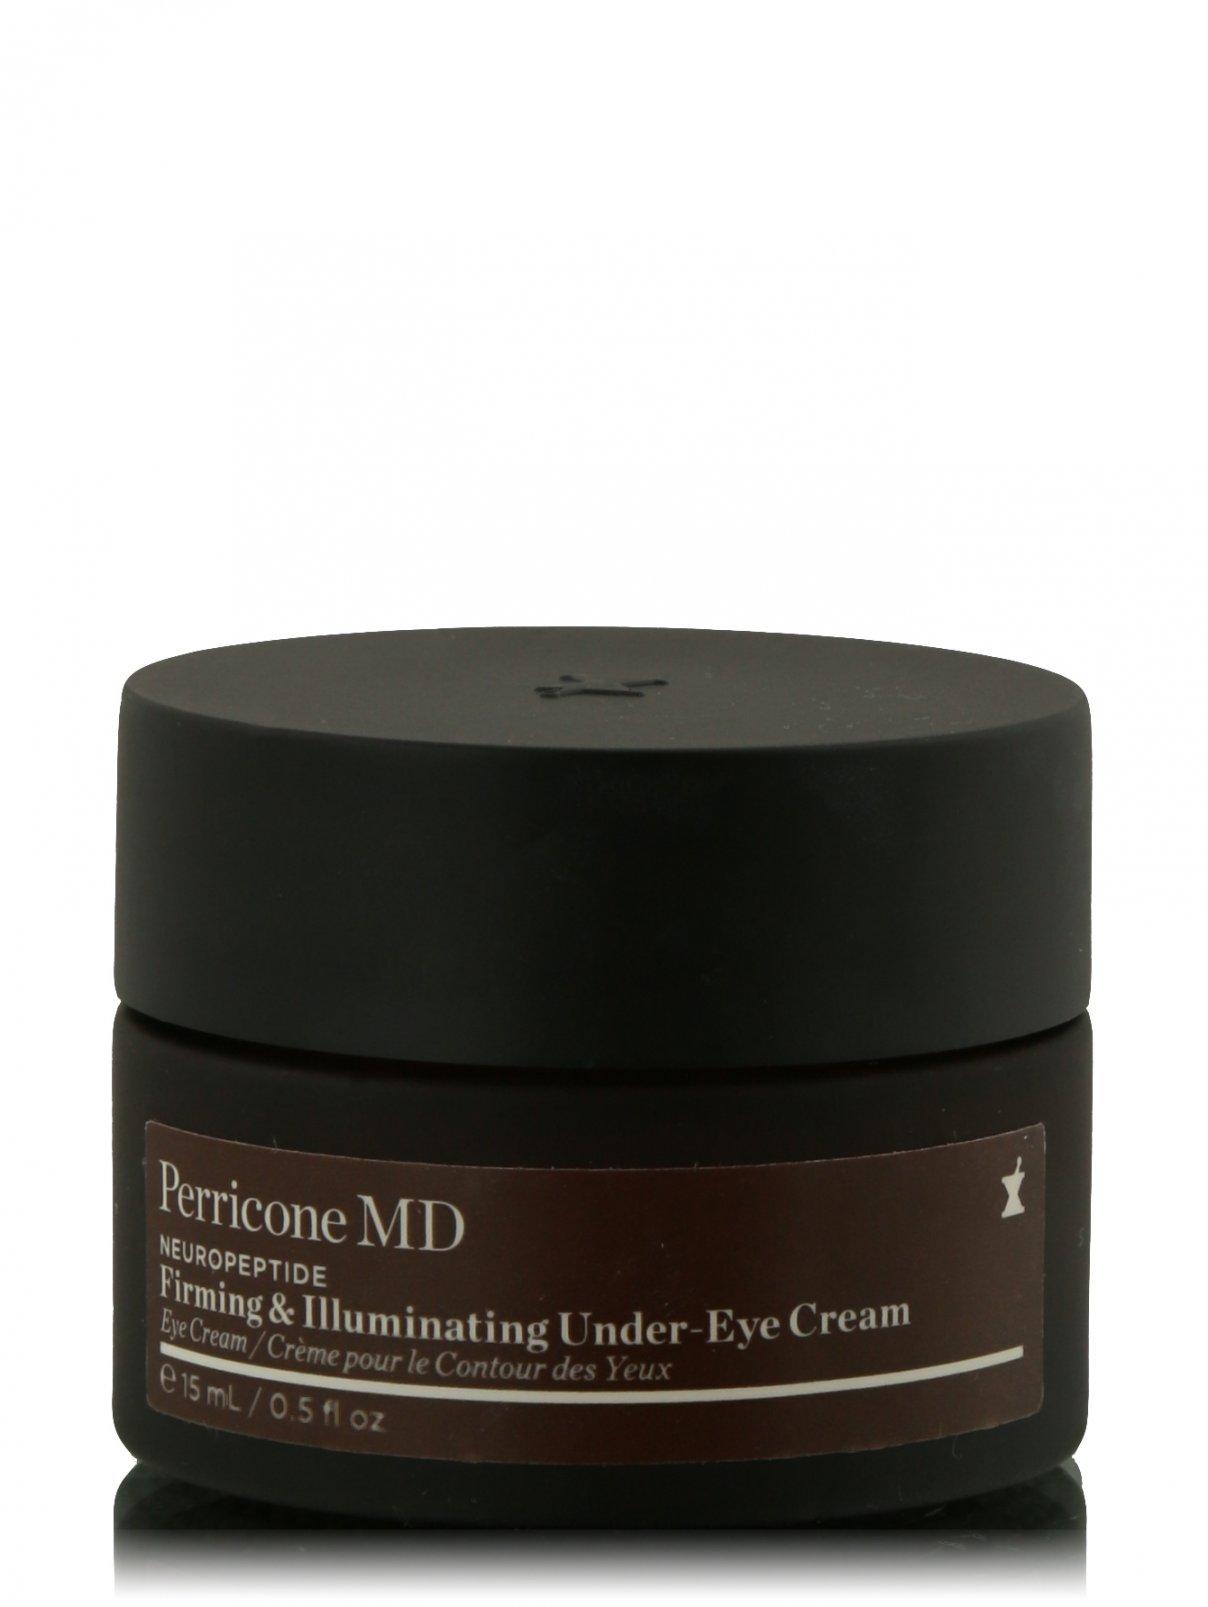 Крем Firming & Illumitaning 15 мл Skin Care Perricone MD  –  Общий вид